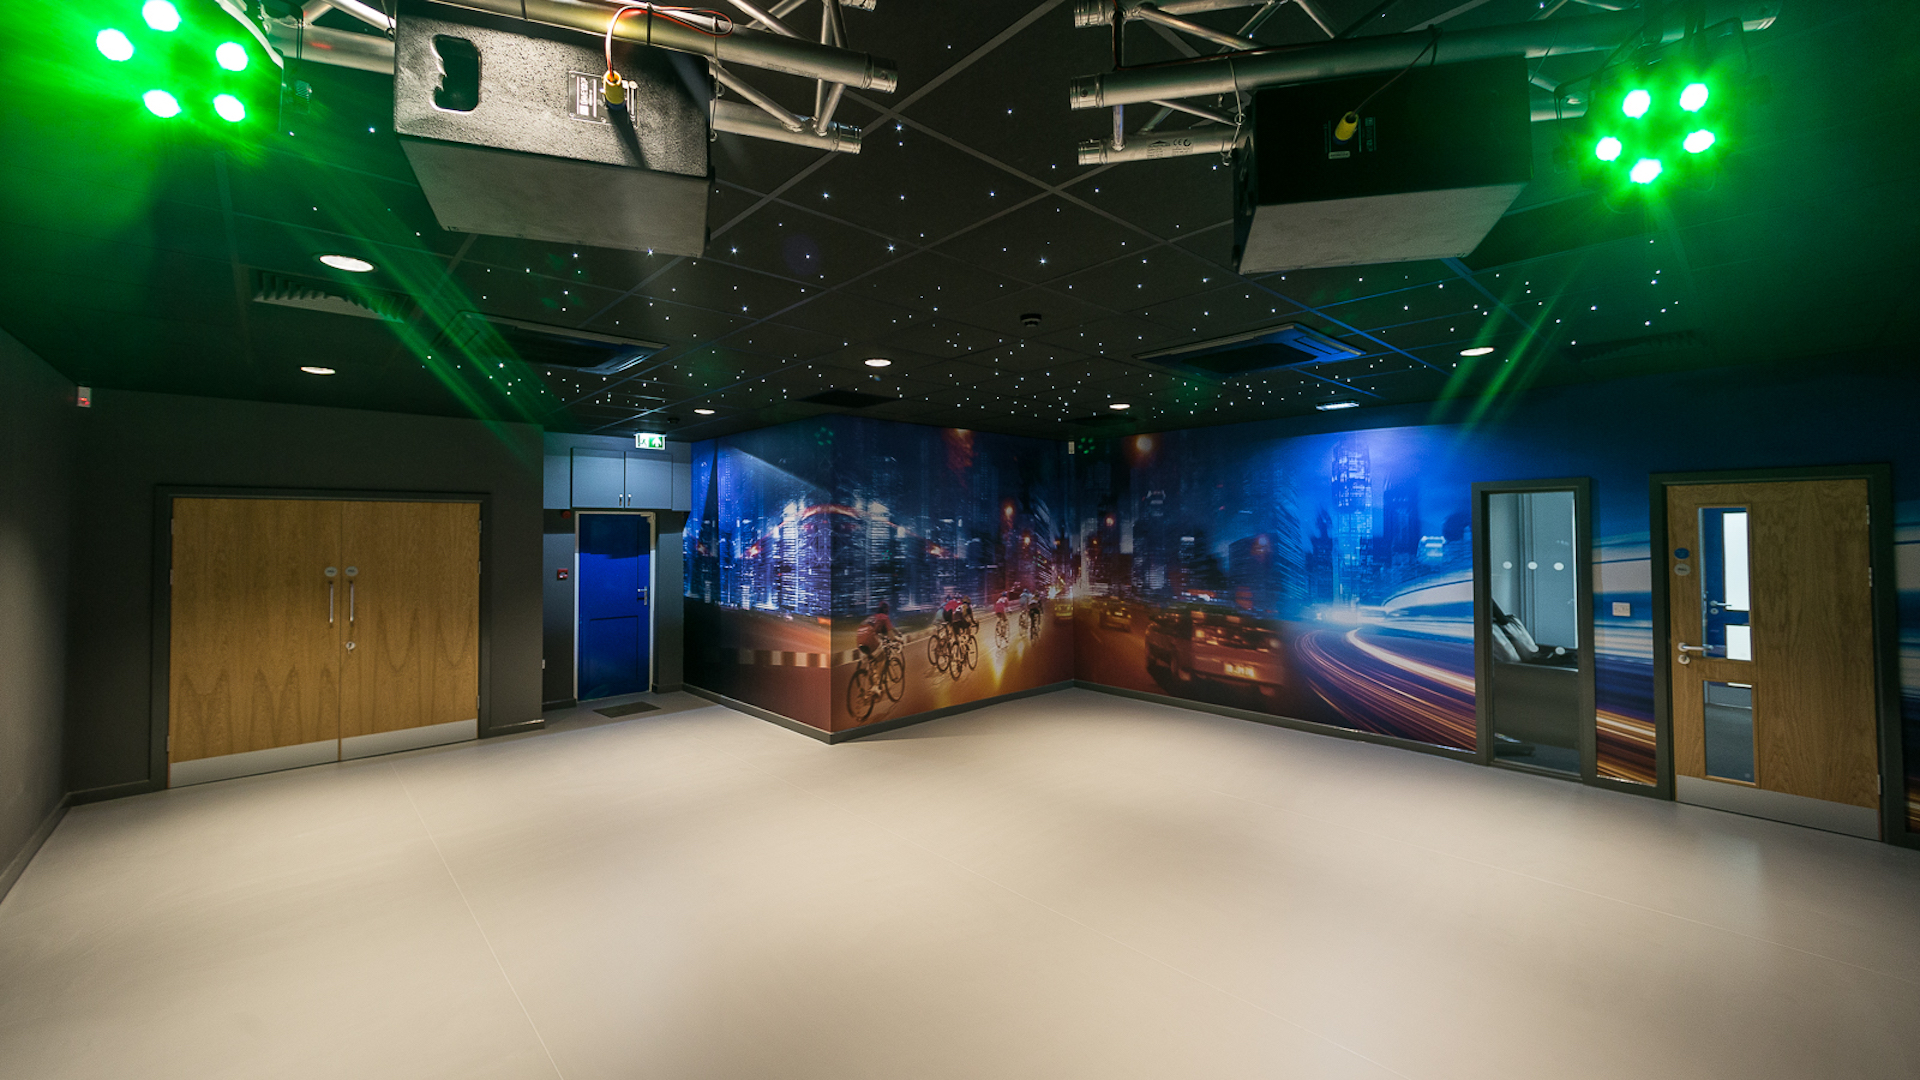 Colne Valley Leisure Centre 2